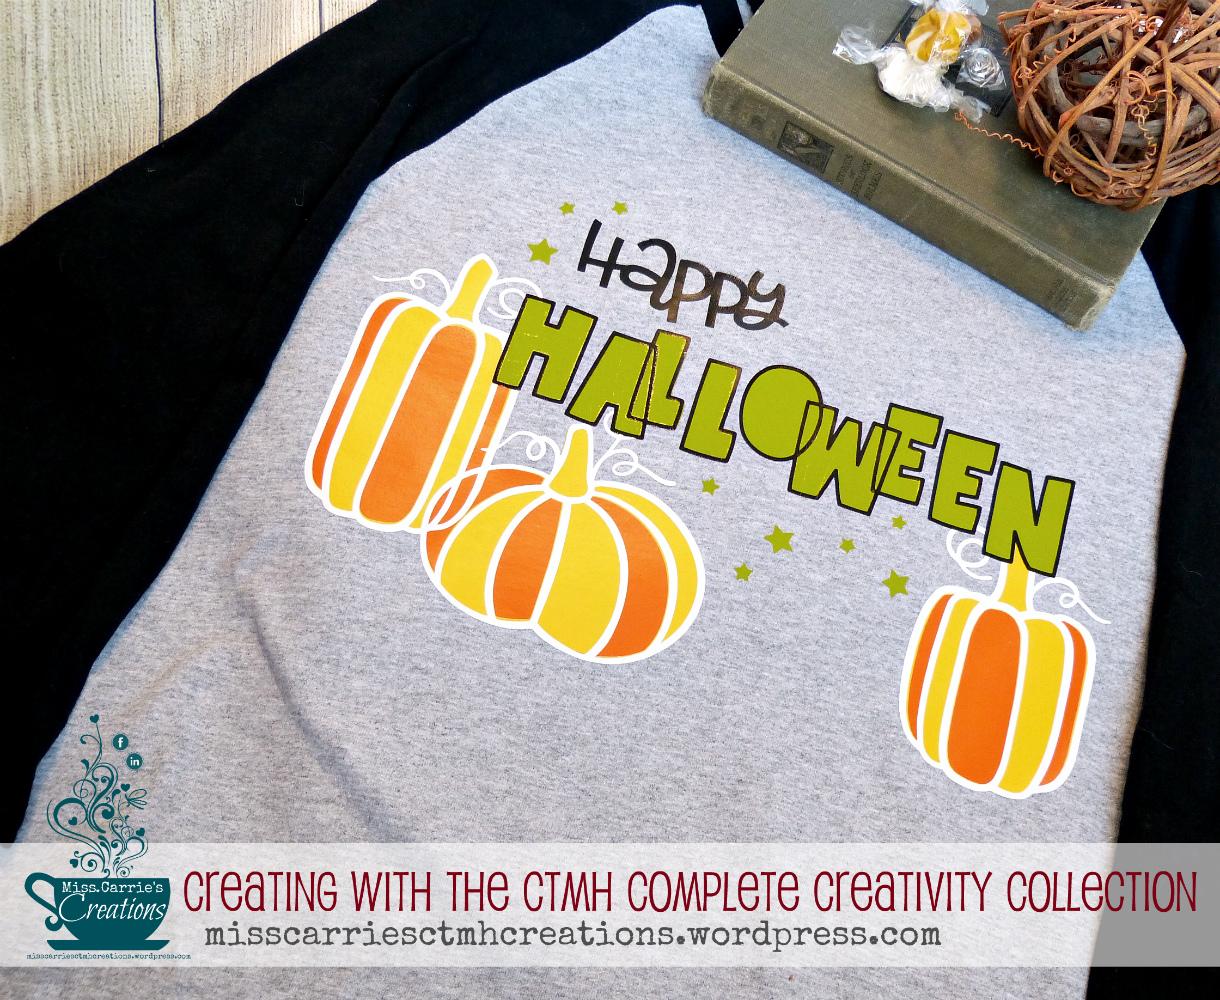 MissCarriesCreations-HalloweenShirtCompleteCreativity